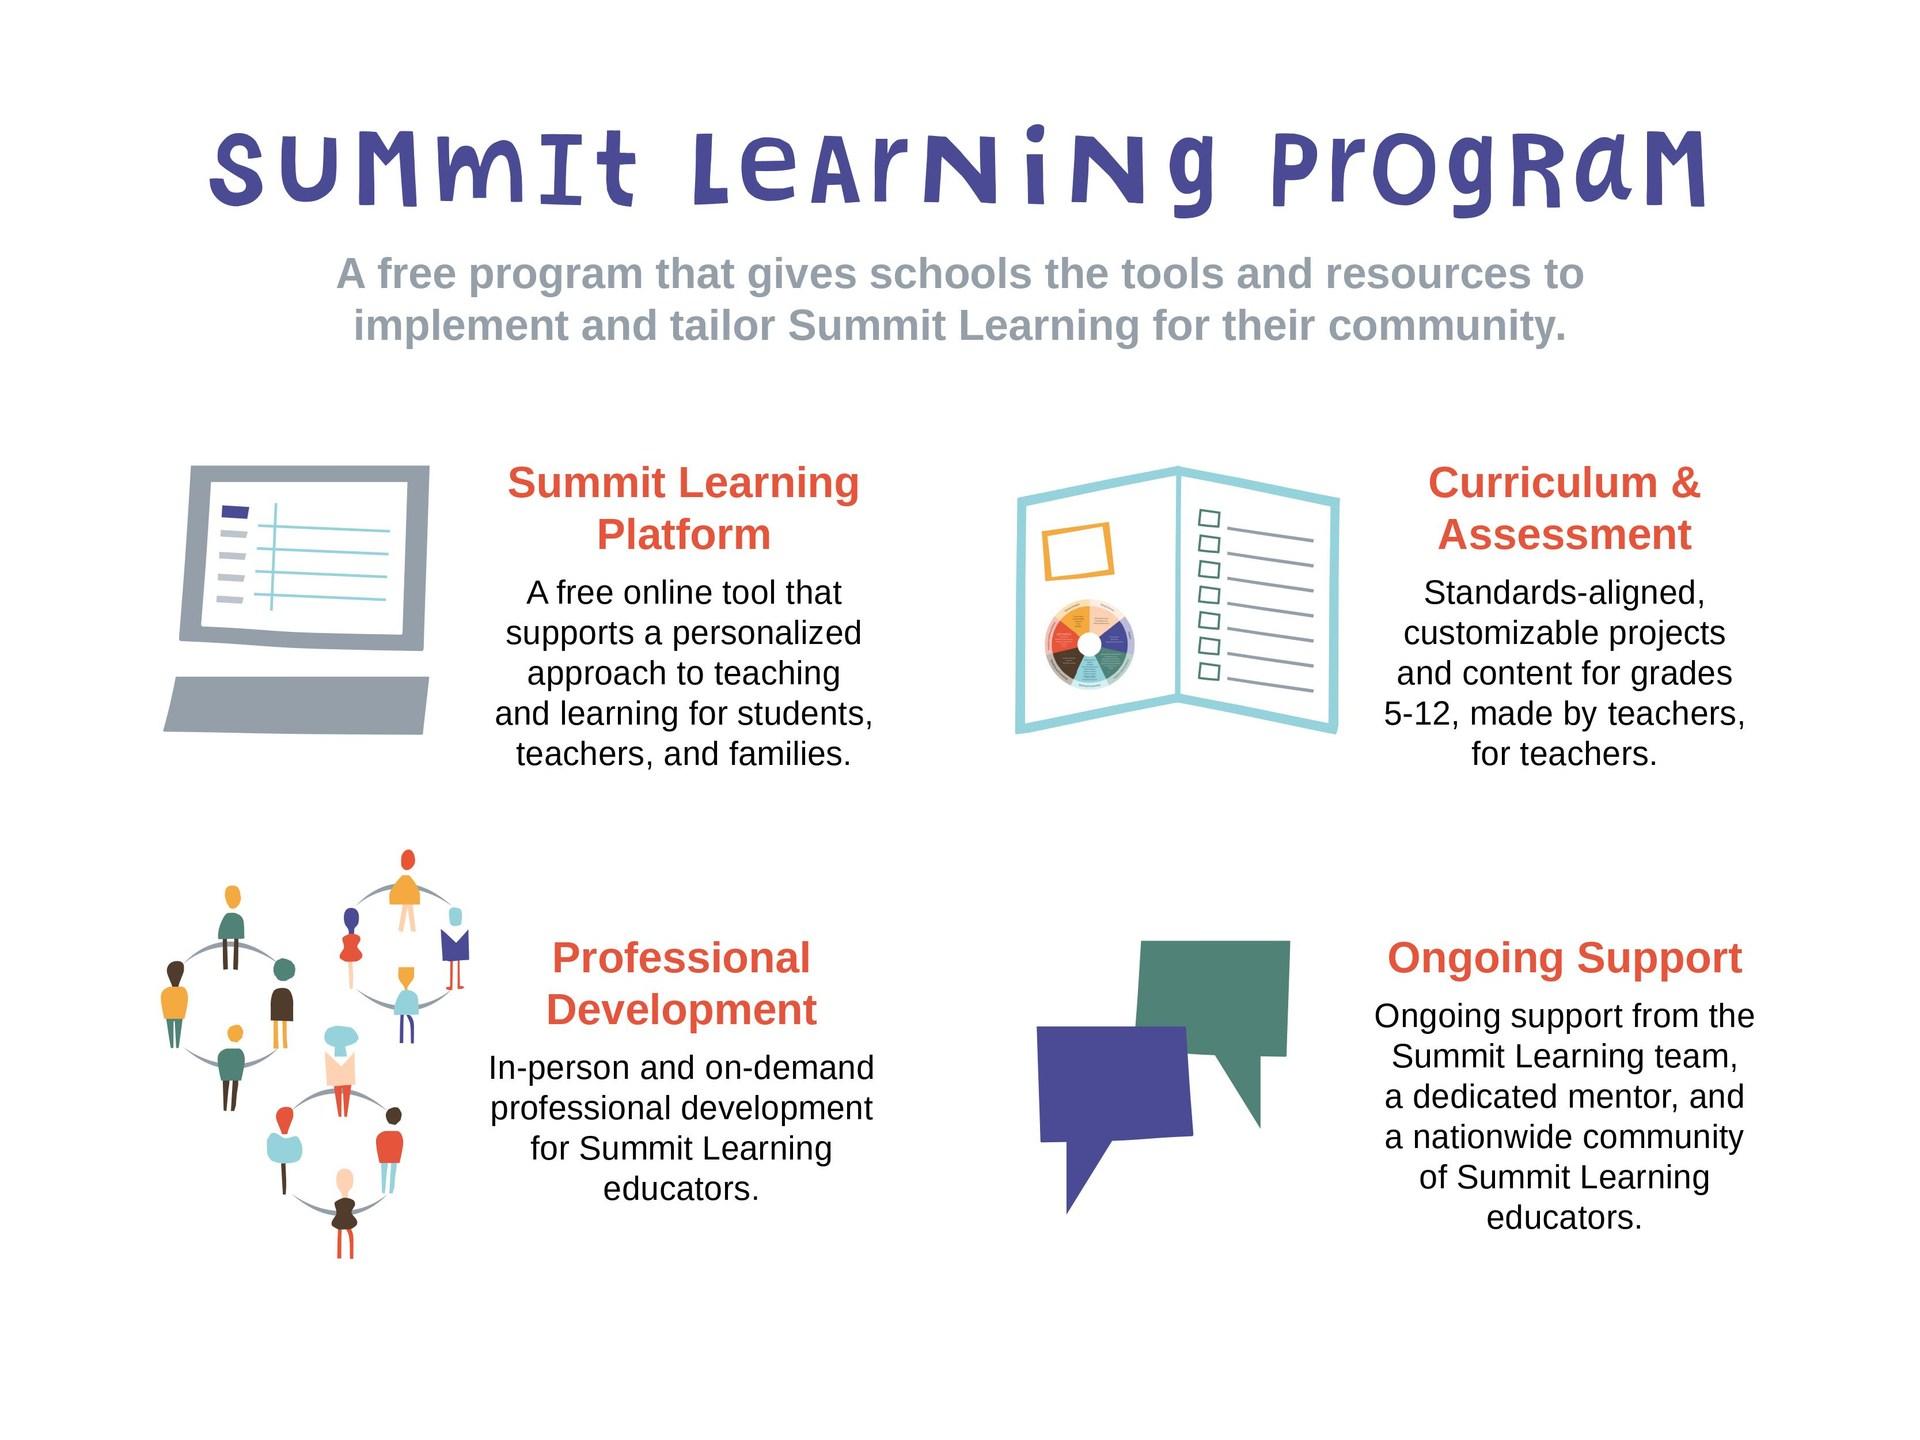 Summit Learning Program graphic